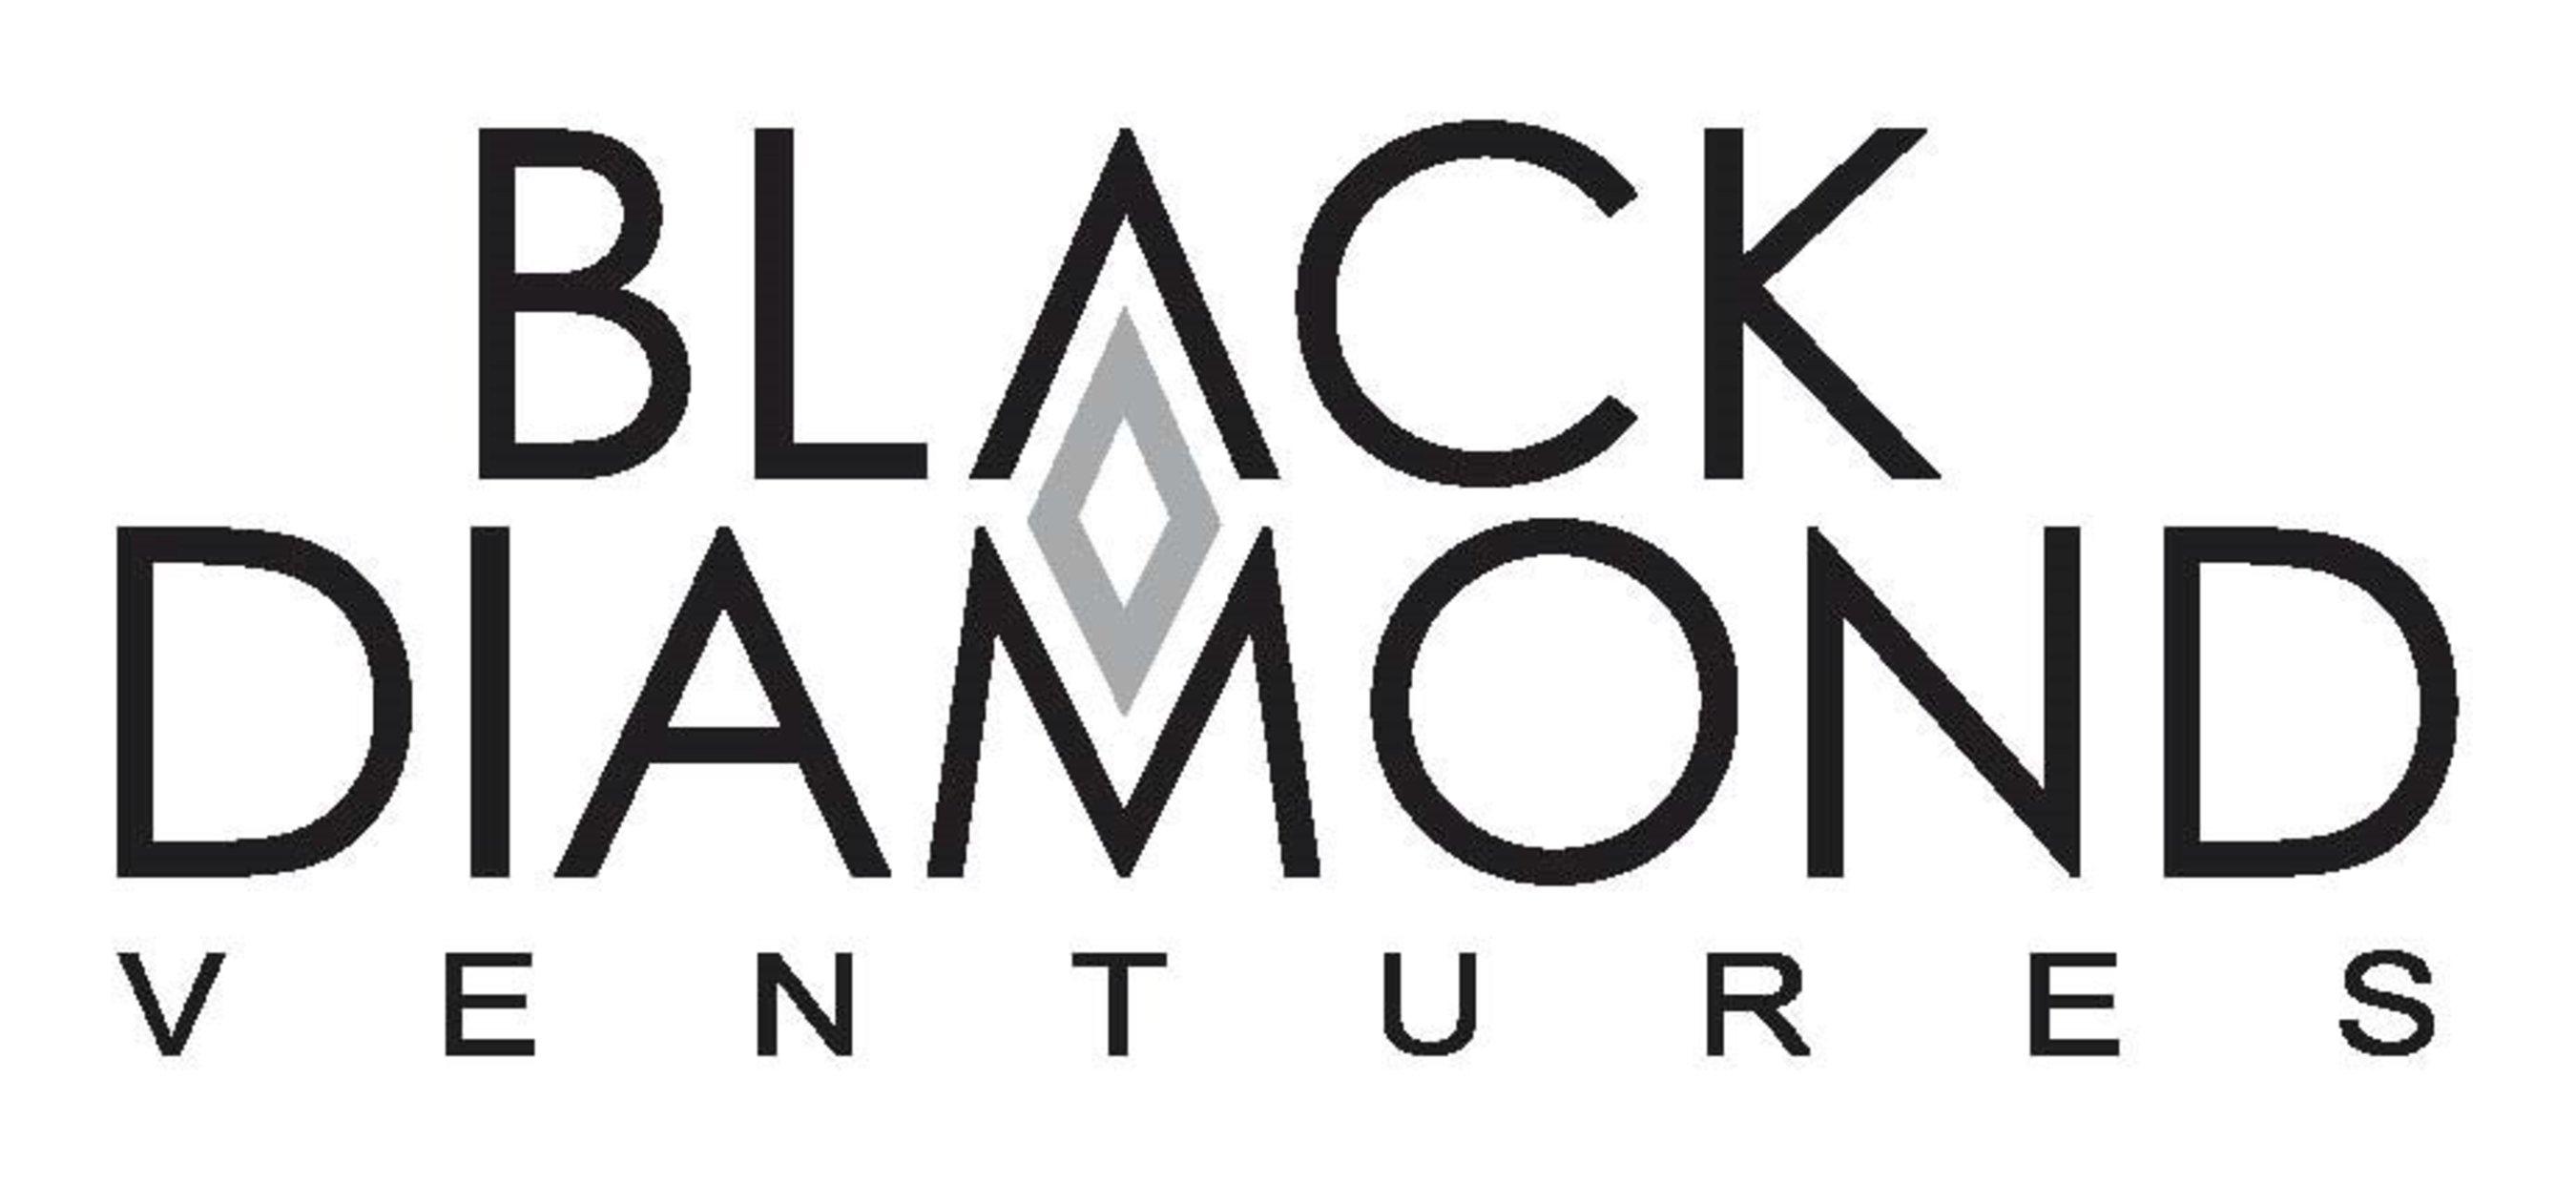 Black Diamond Ventures Logo